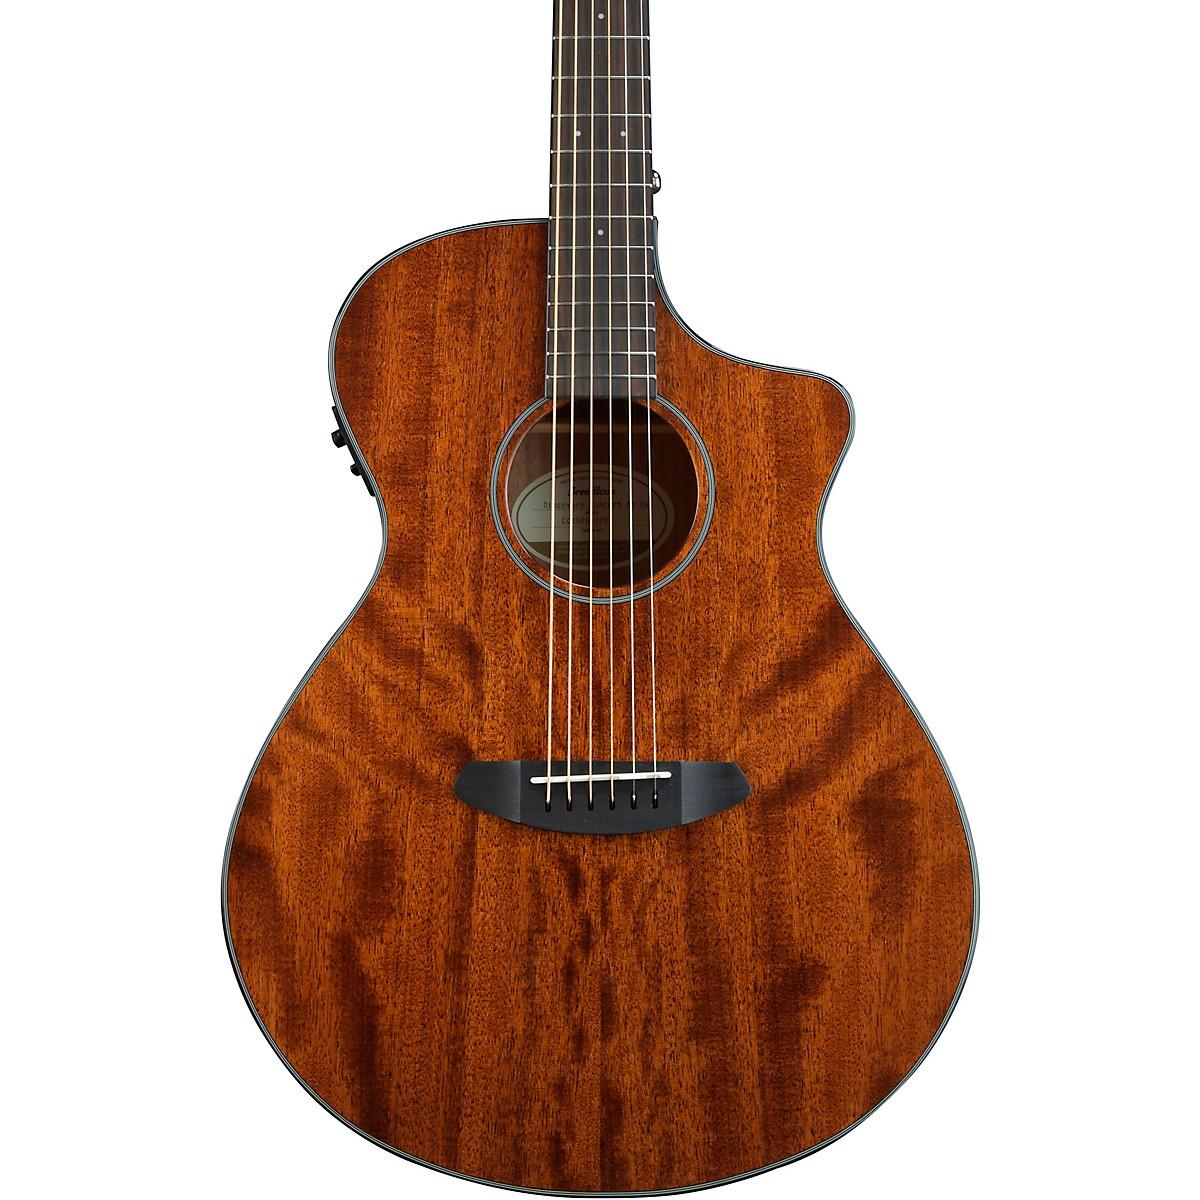 Breedlove Discovery Concert Cutaway CE Mahogany-Mahogany Acoustic-Electric Guitar